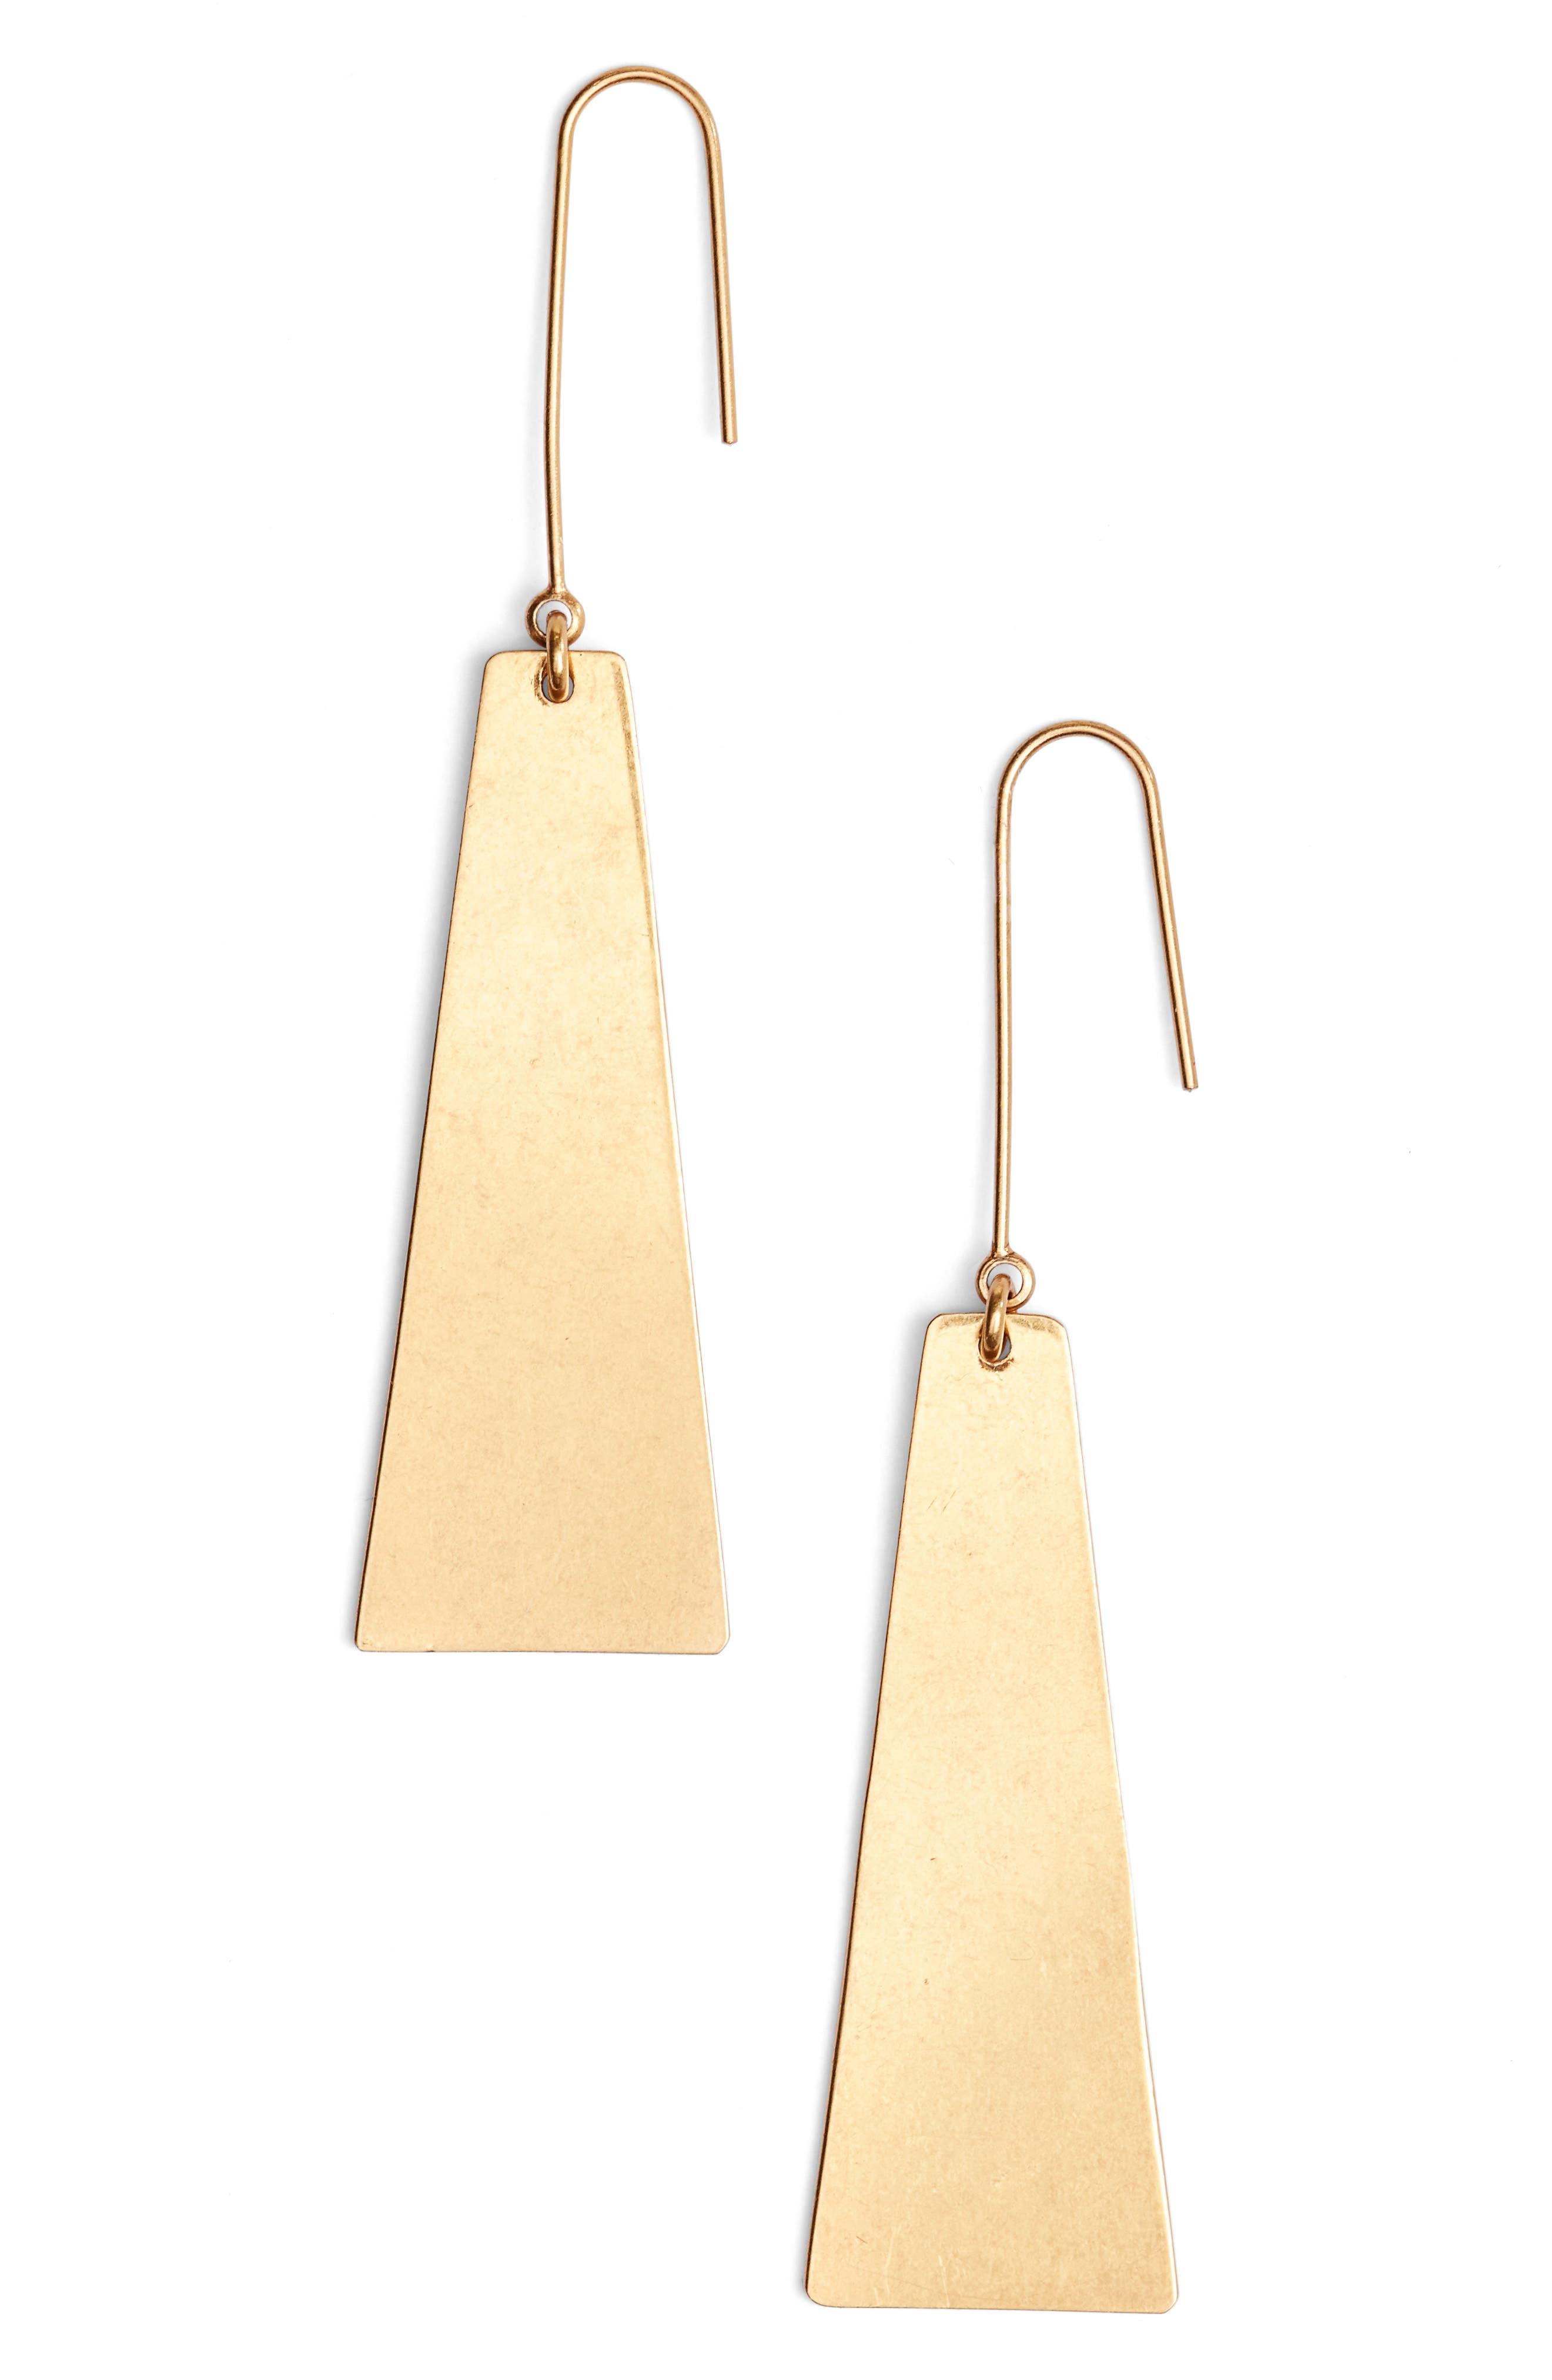 Madewell Petaldrop Earrings